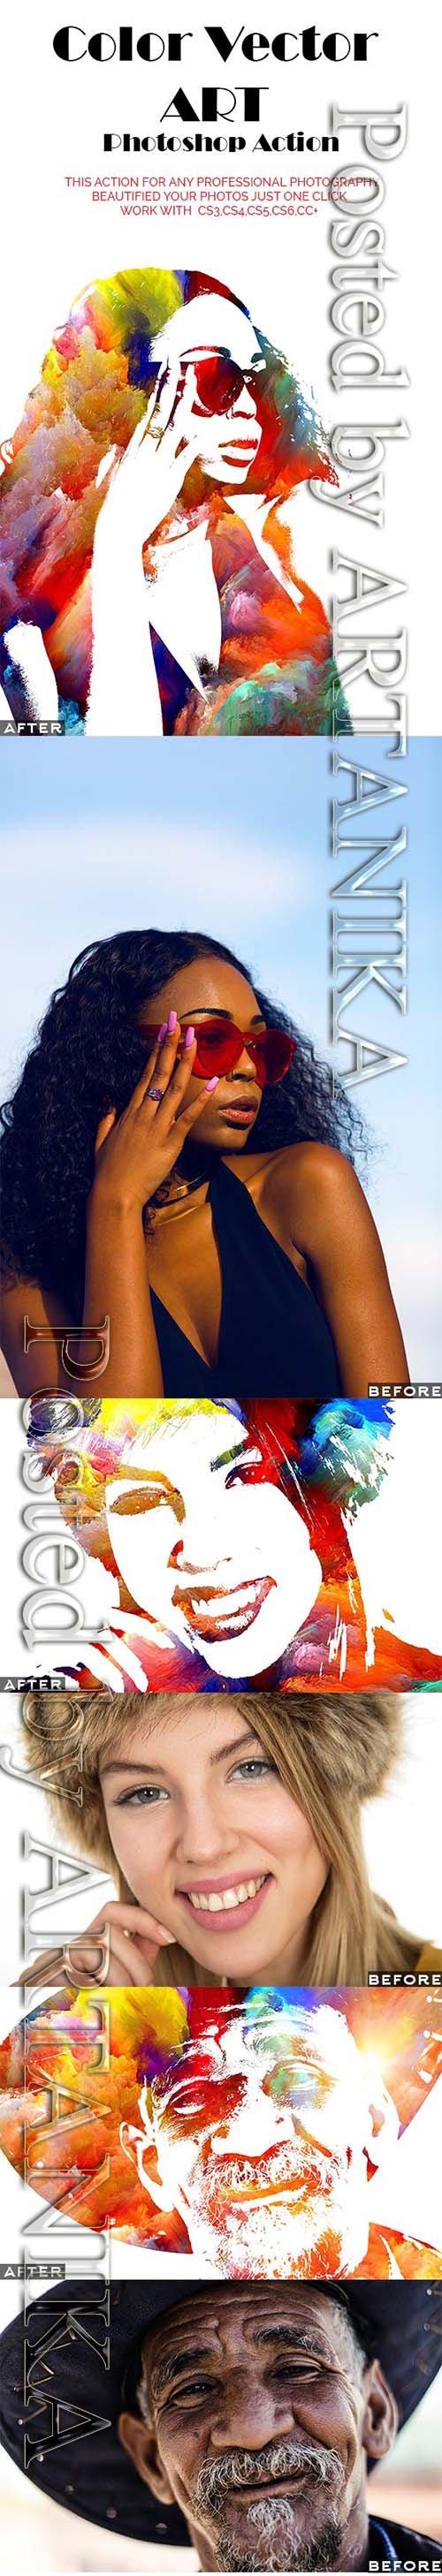 Color Vector ART Photoshop Action 21390337